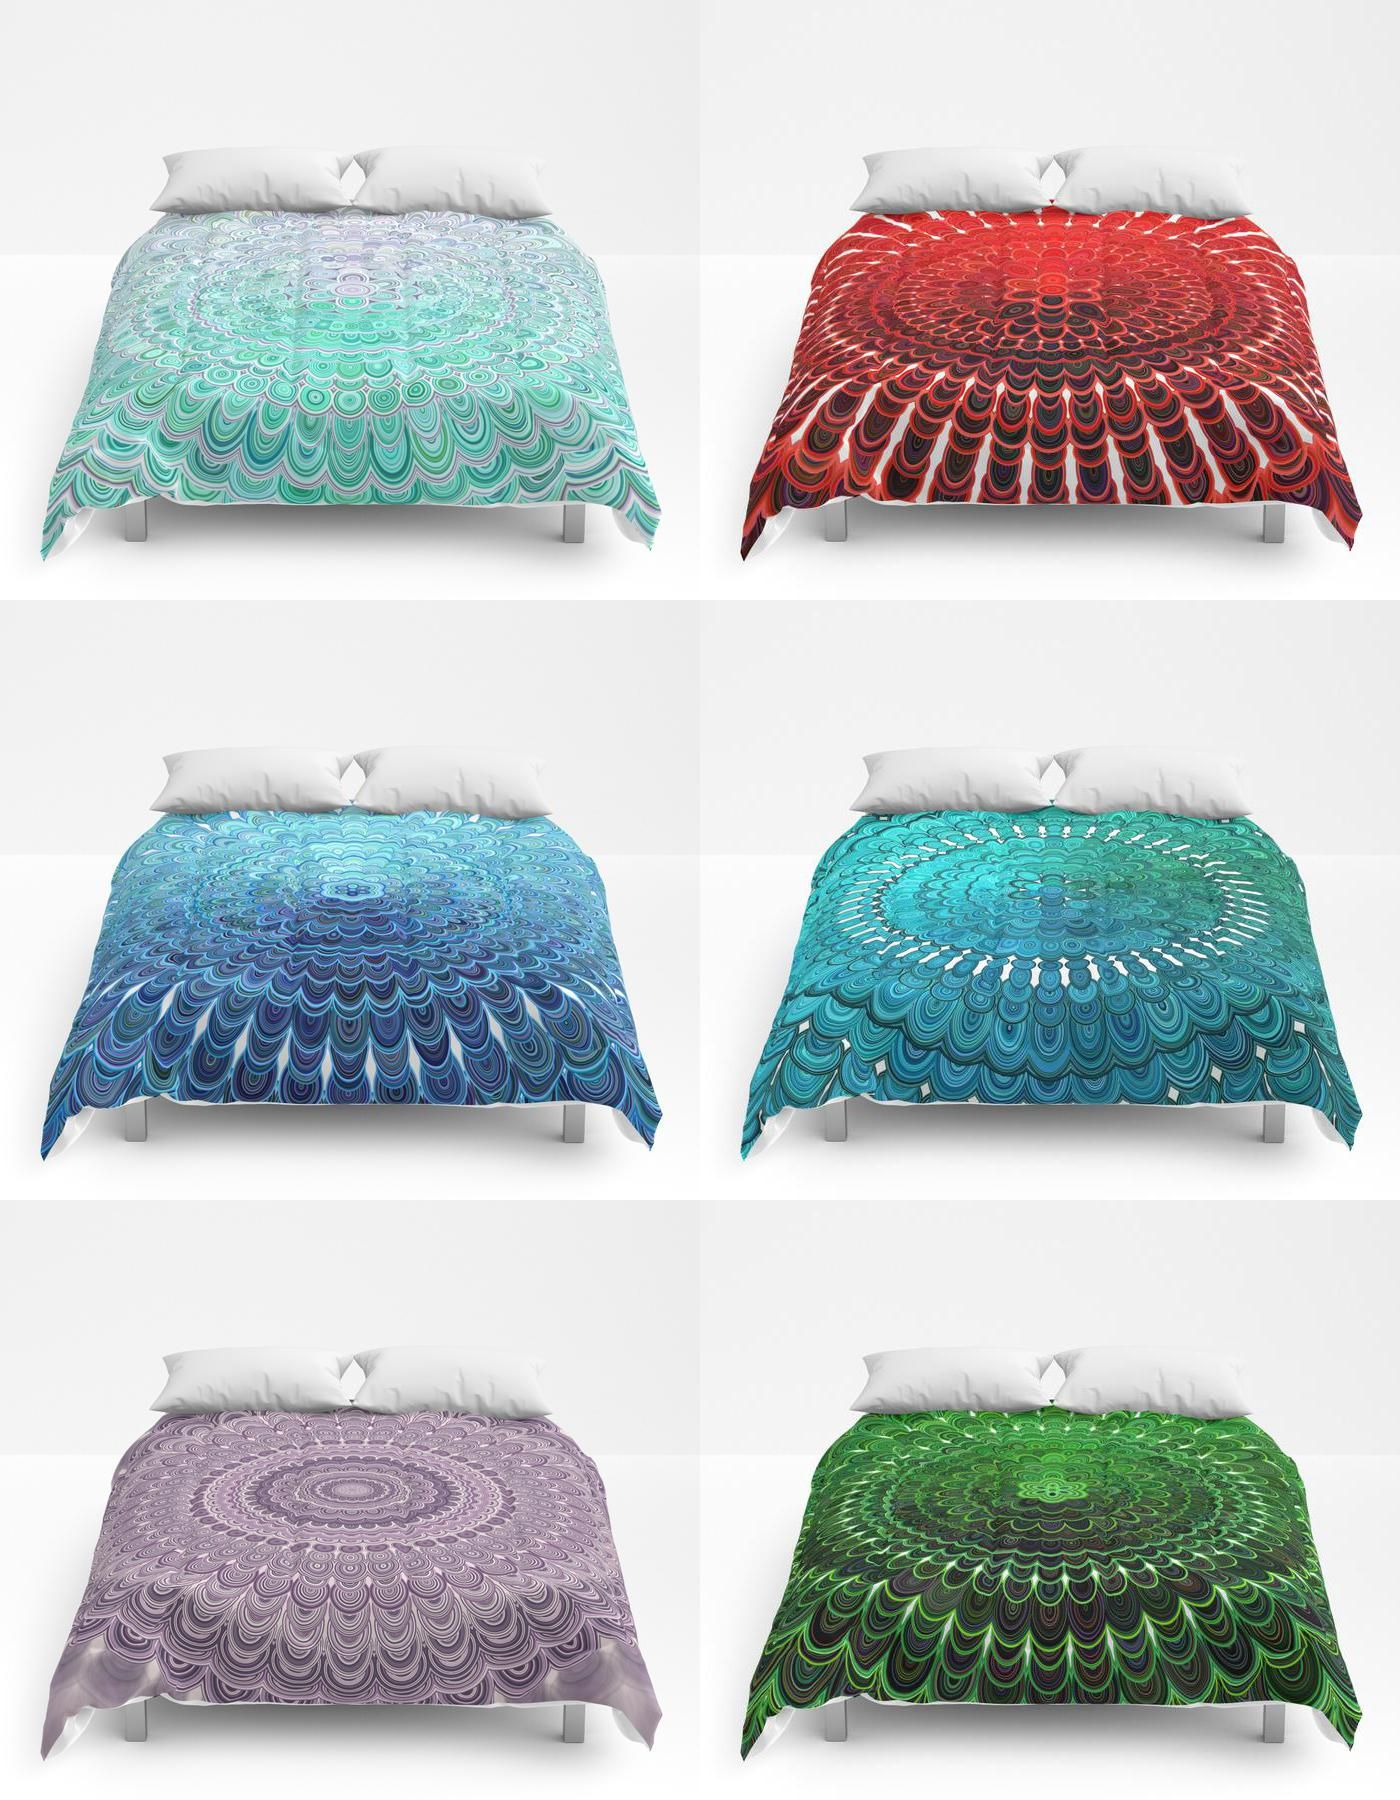 colorful mandala comforters by david zydd graphic art giftidea